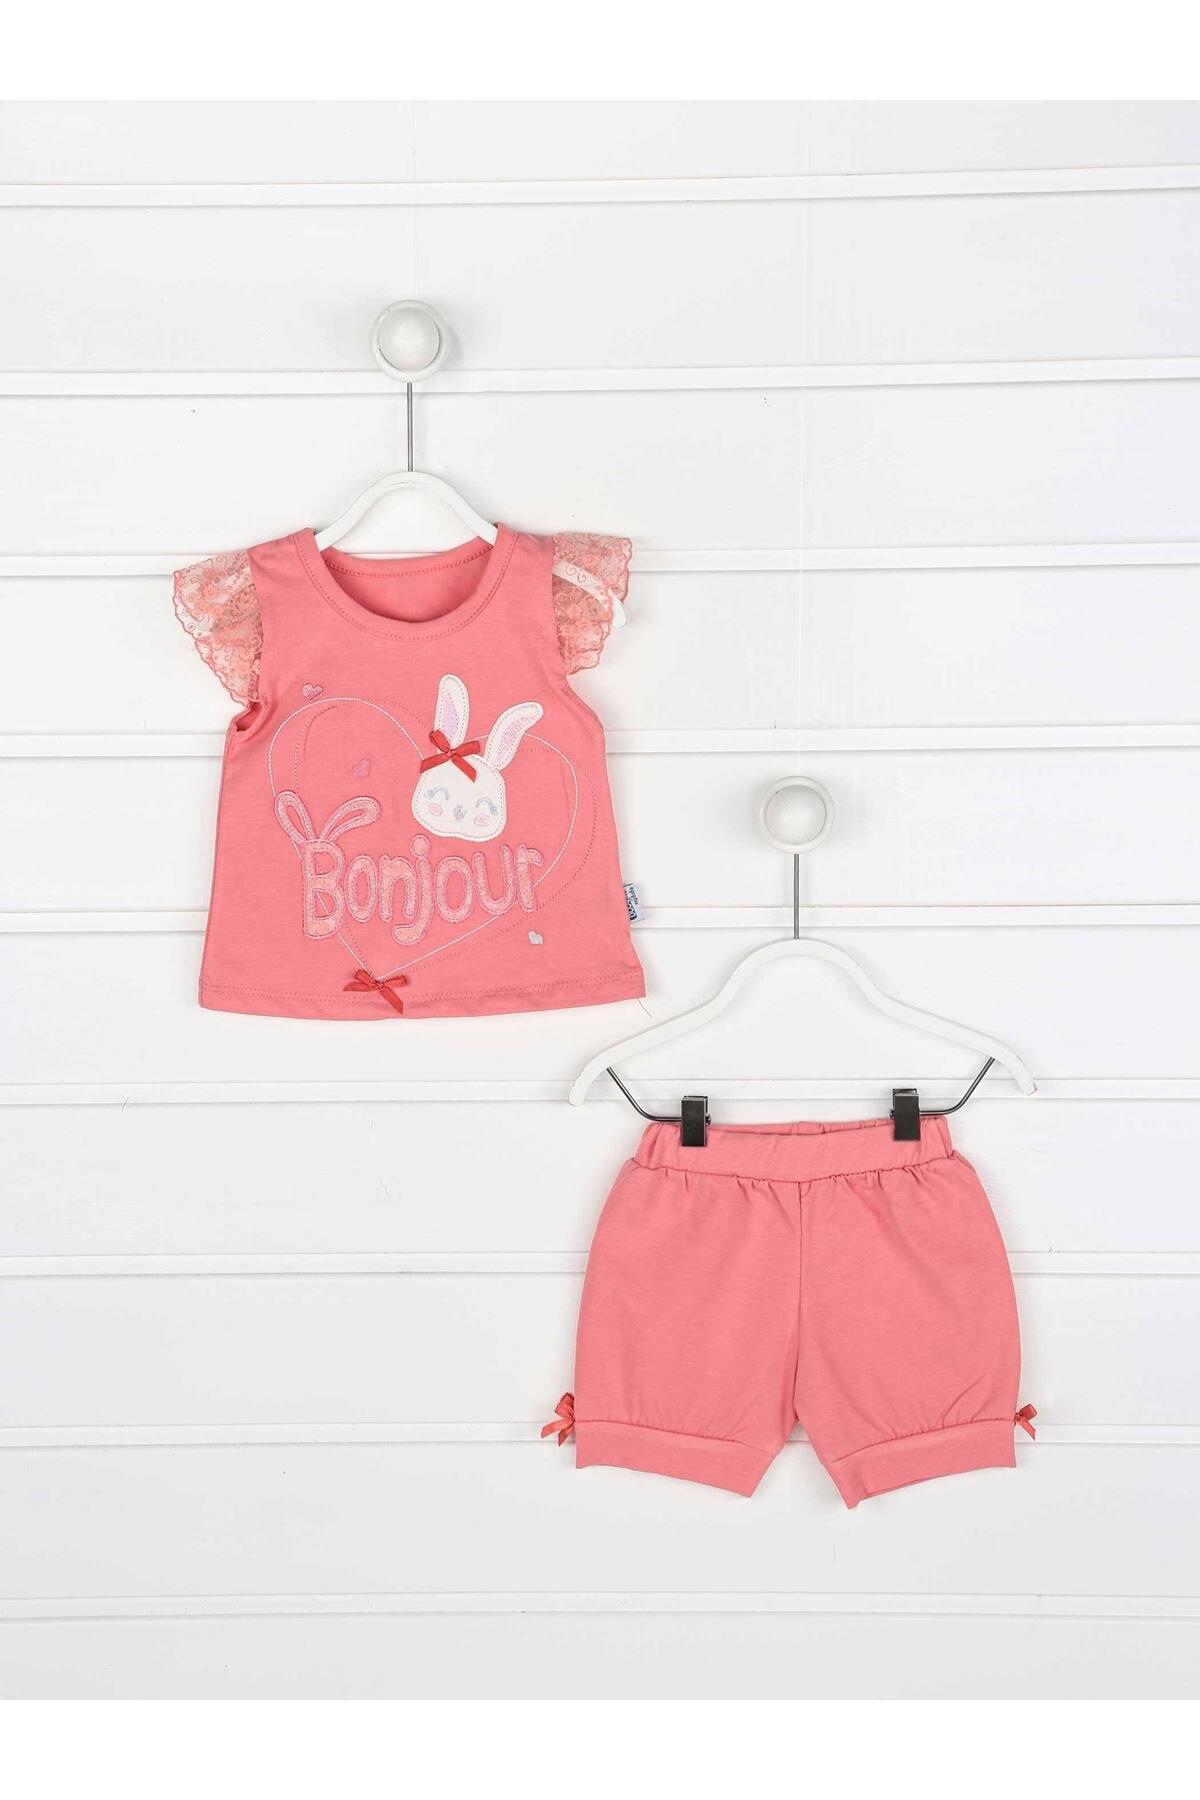 Grenadine Rot Mädchen Baby Shorts Anzug